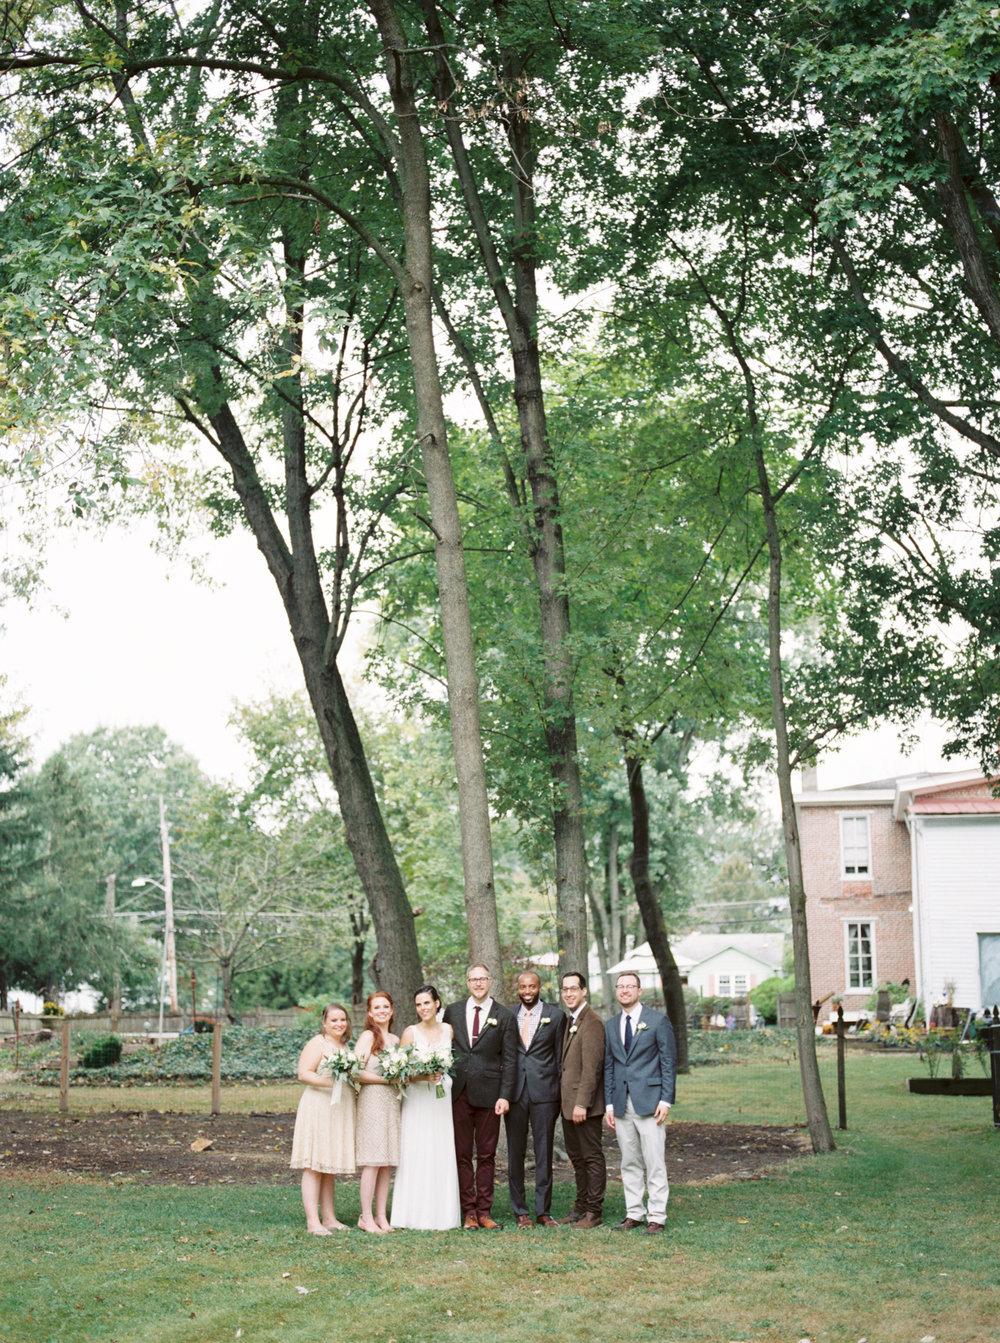 haley-richter-photography-new-jersey-backyard-wedding-212.jpg